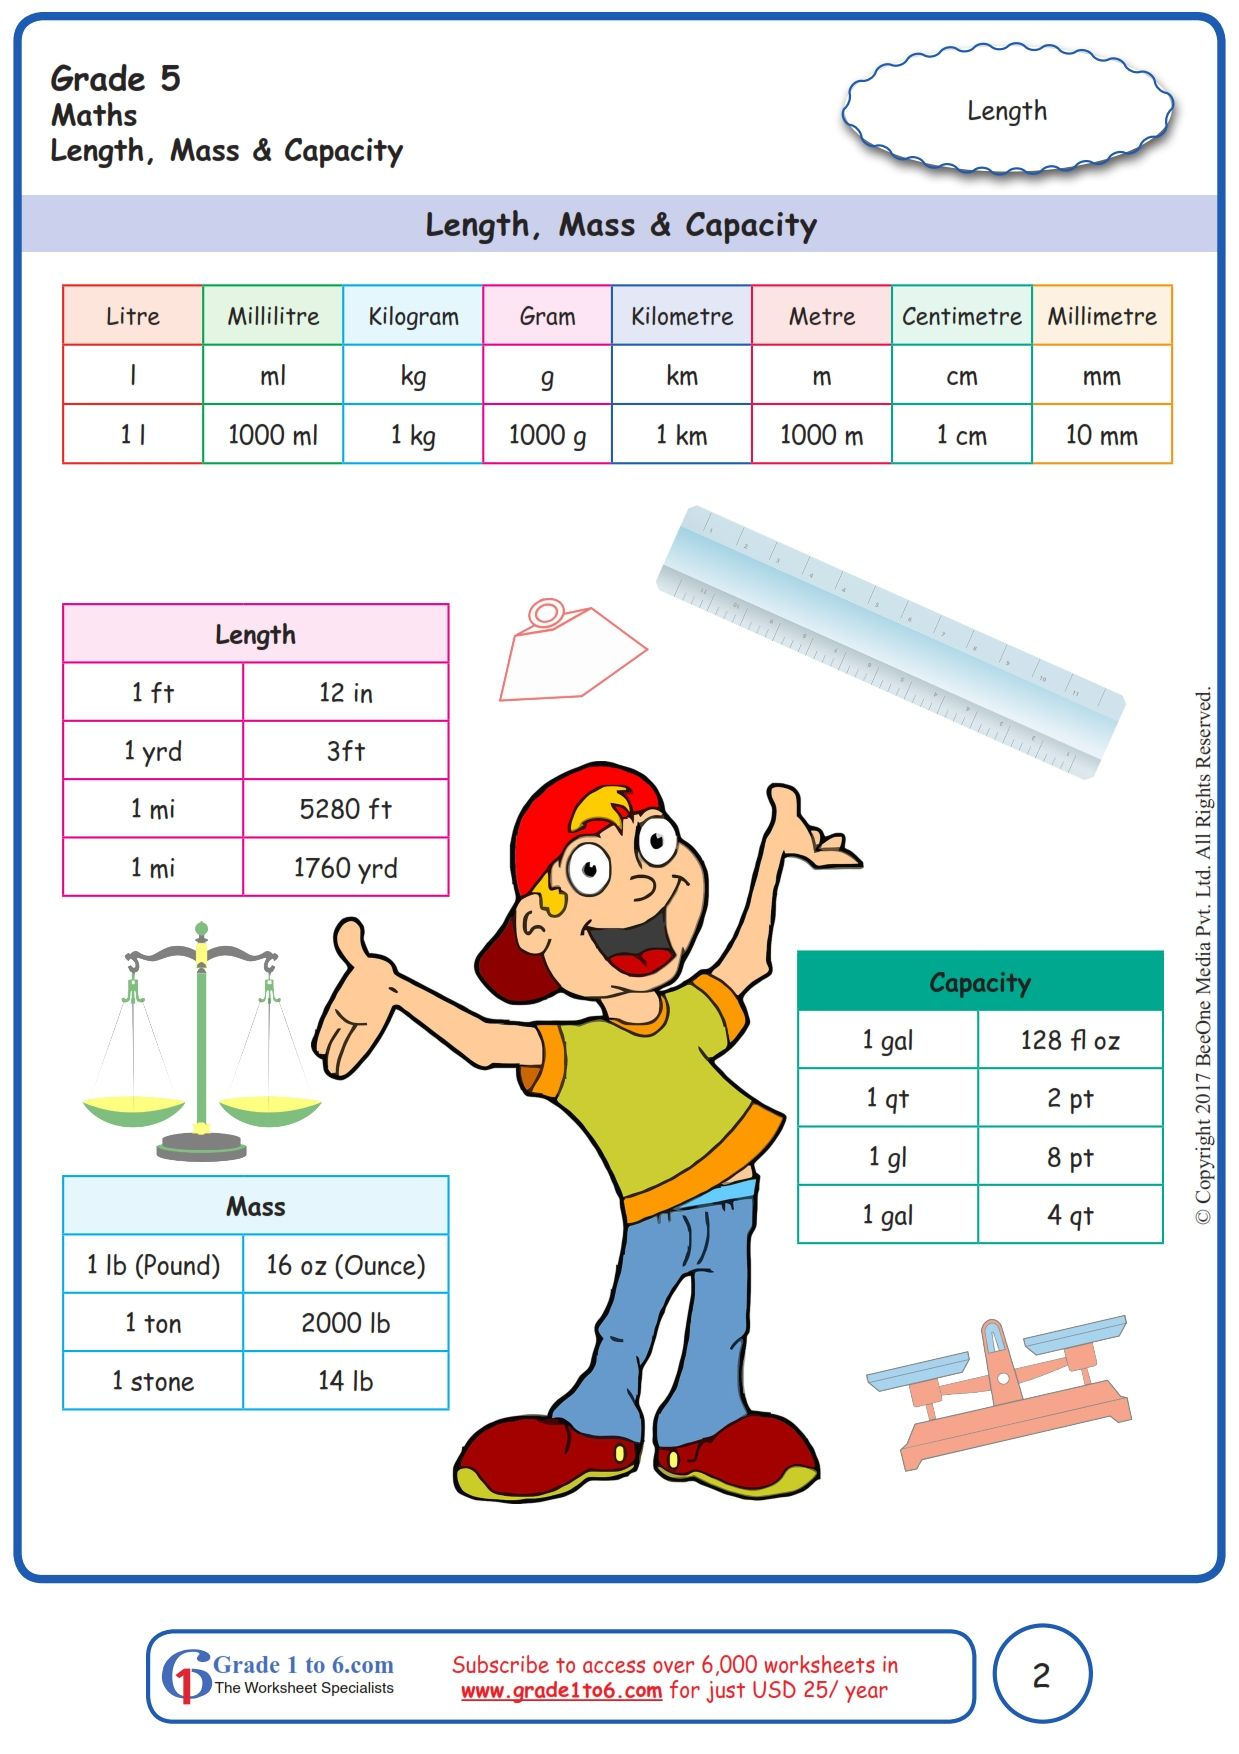 Worksheet Grade 5 Math Length Mass \u0026 Capacity   Free math worksheets [ 1754 x 1239 Pixel ]